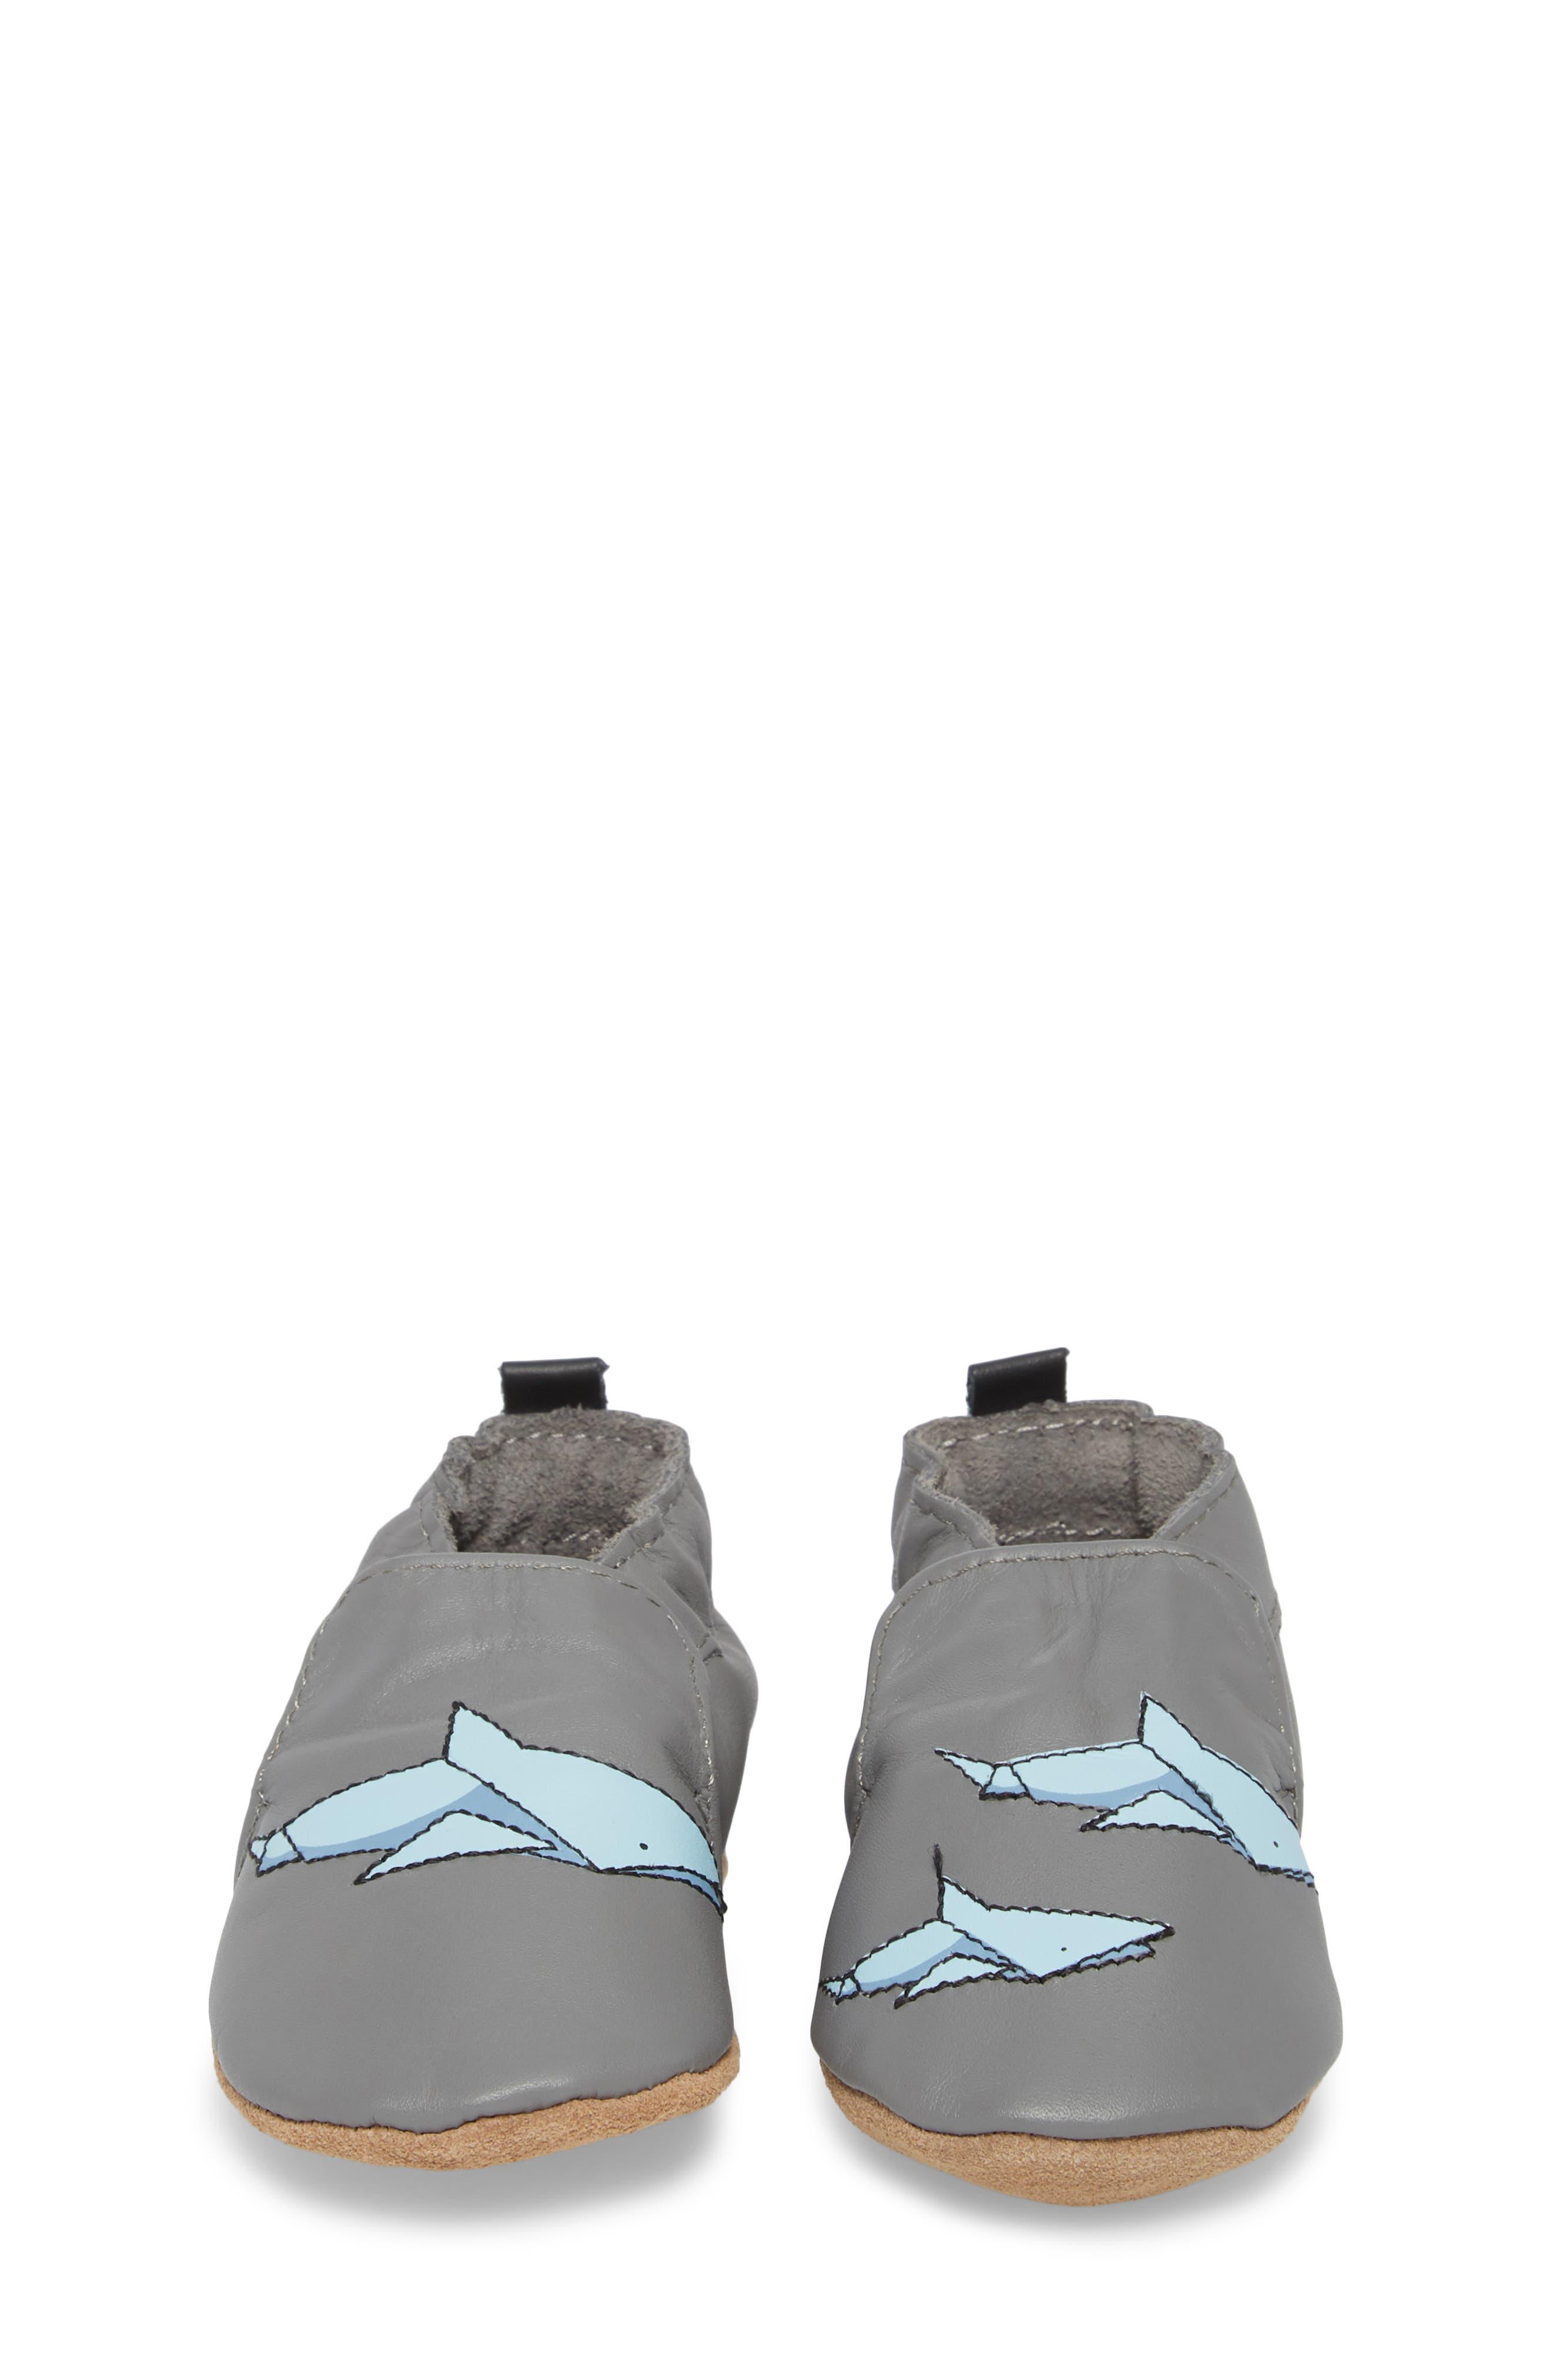 Sharktastic Moccasin Crib Shoe,                             Alternate thumbnail 4, color,                             GREY